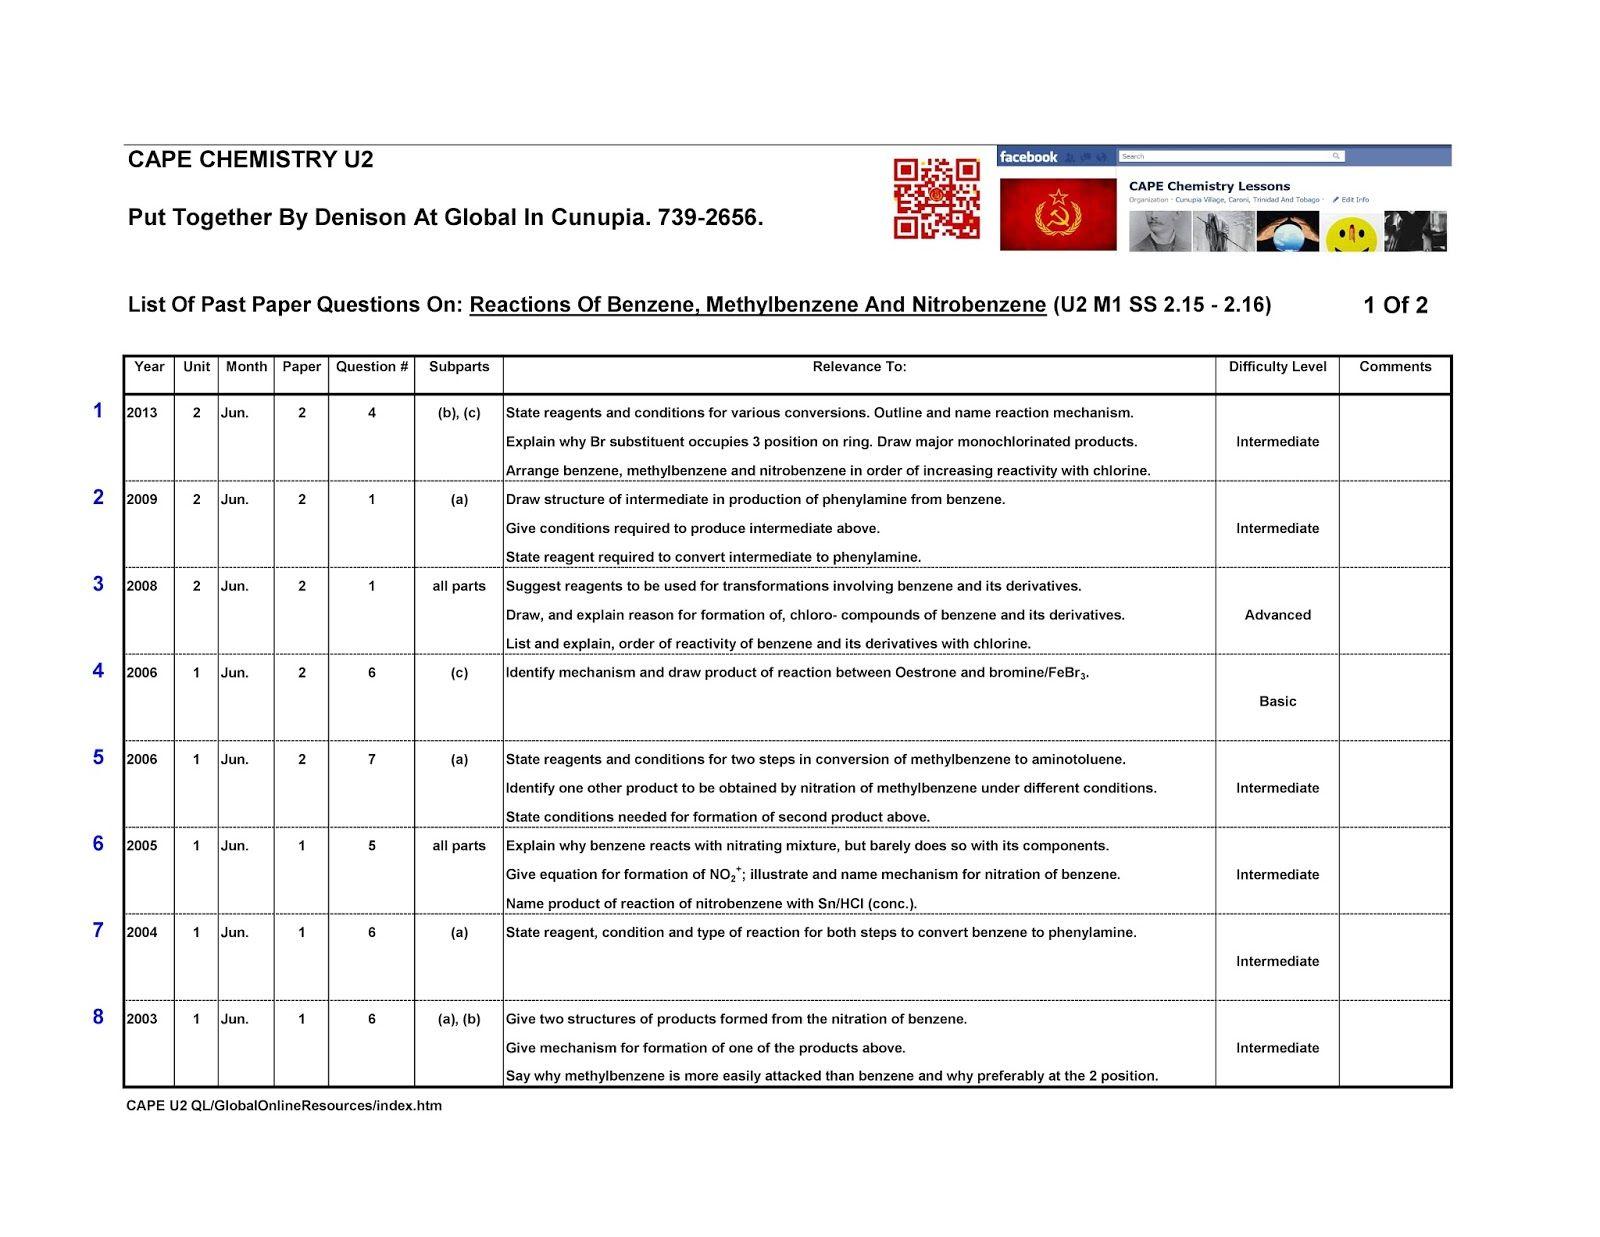 CAPE Chemistry Question Lists - Unit 2: 11 U2 M1 SS 2 15 - 2 16